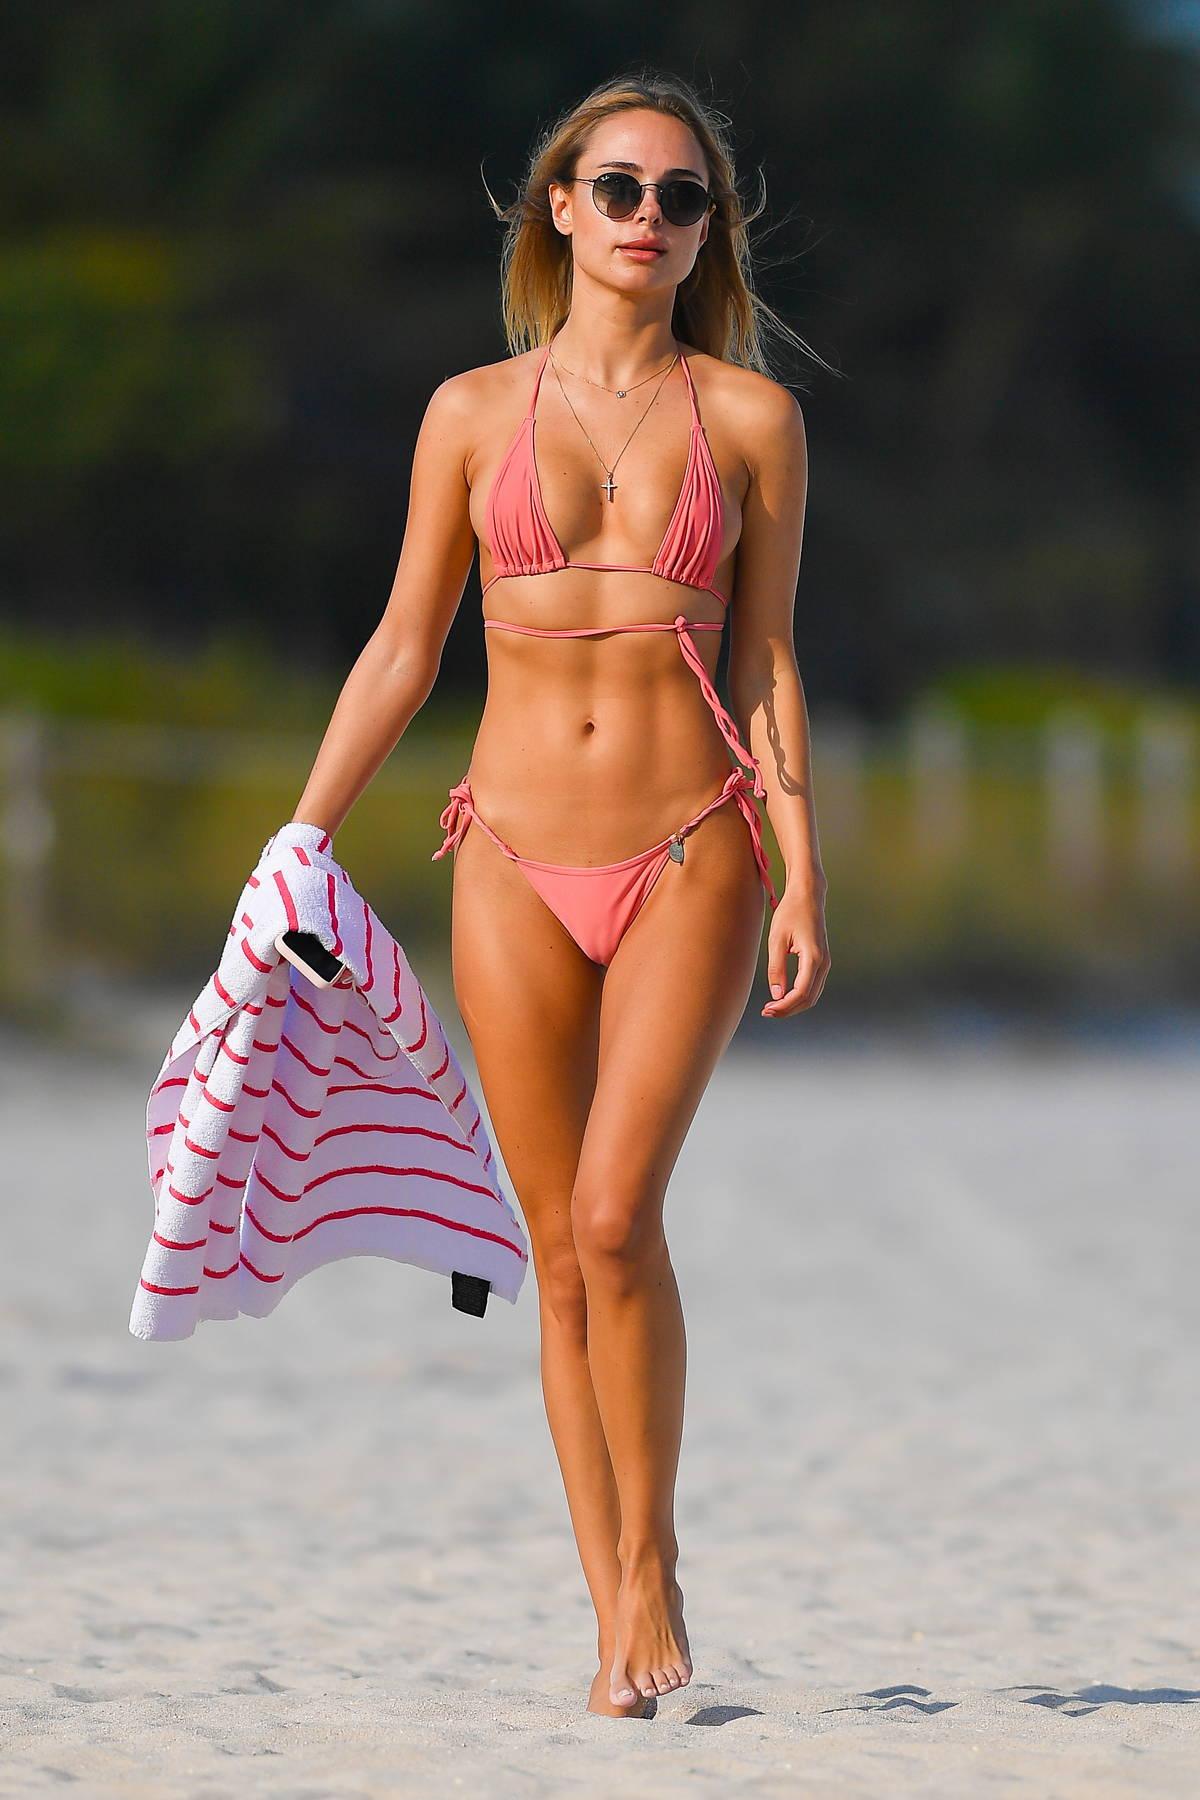 Kimberley Garner looks flawless in a pink bikini as she enjoys the beach in Miami, Florida